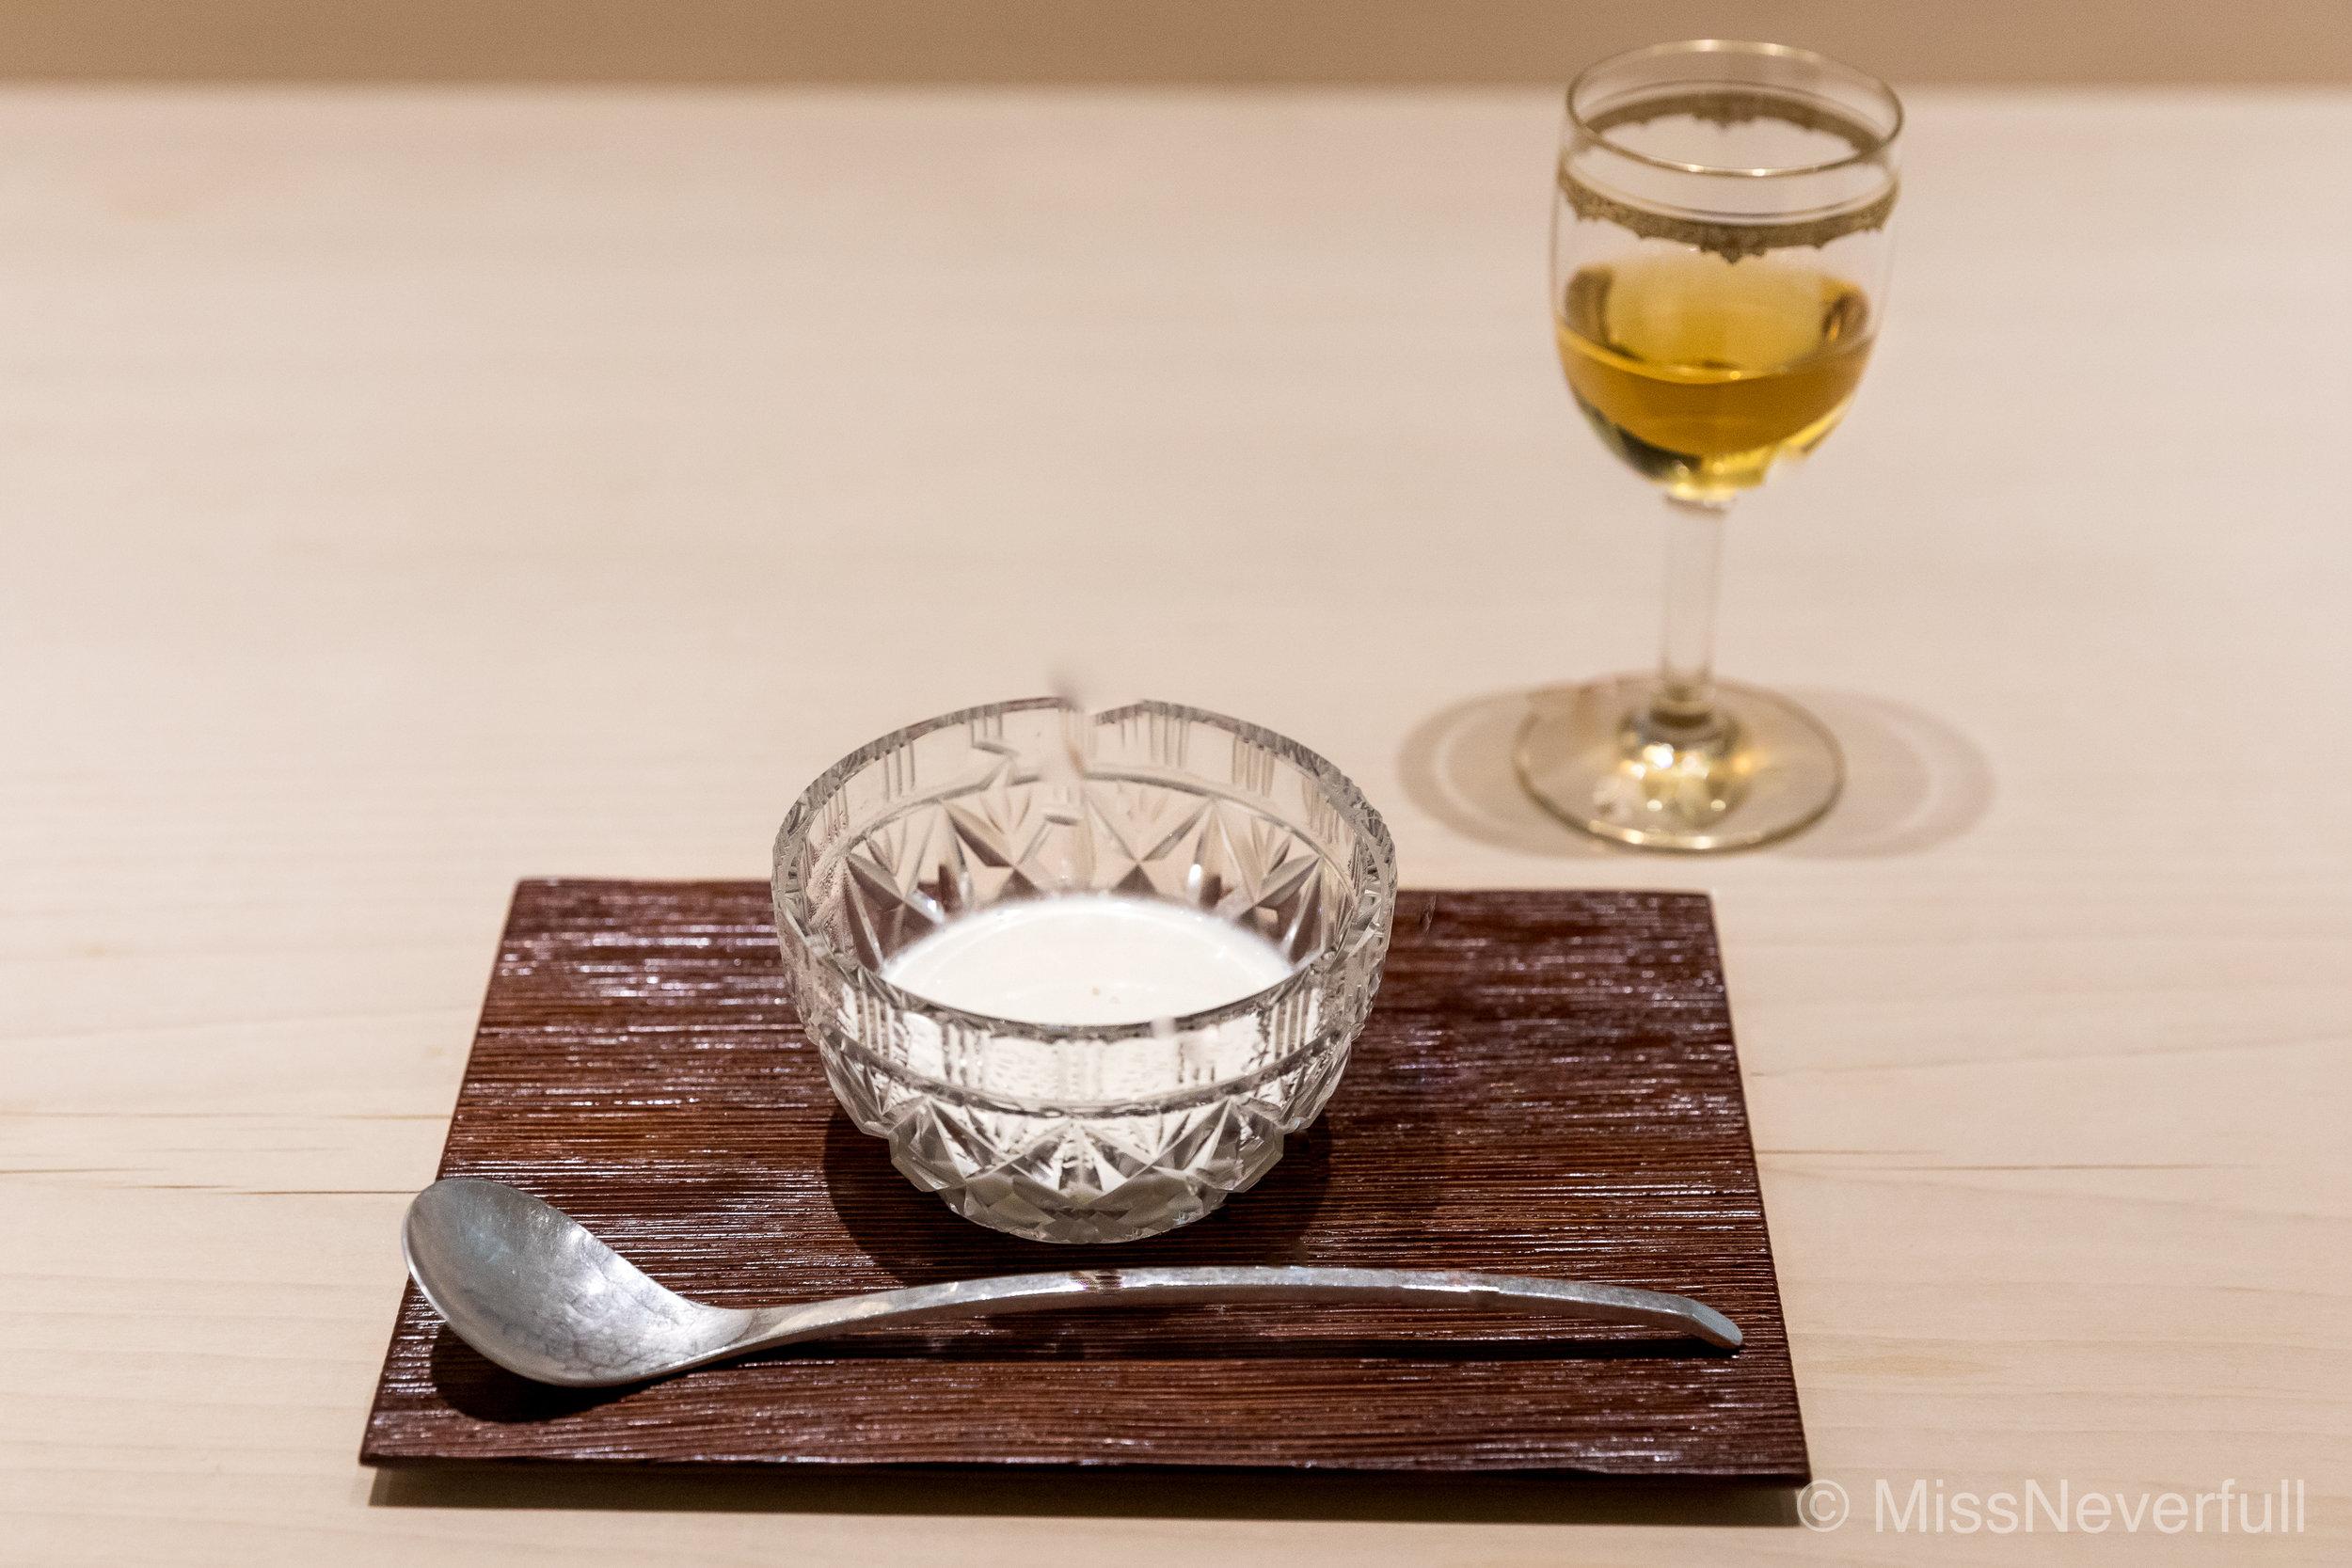 15.Vanilla blanc mange, salt, pair with chateau d'yquem 1999